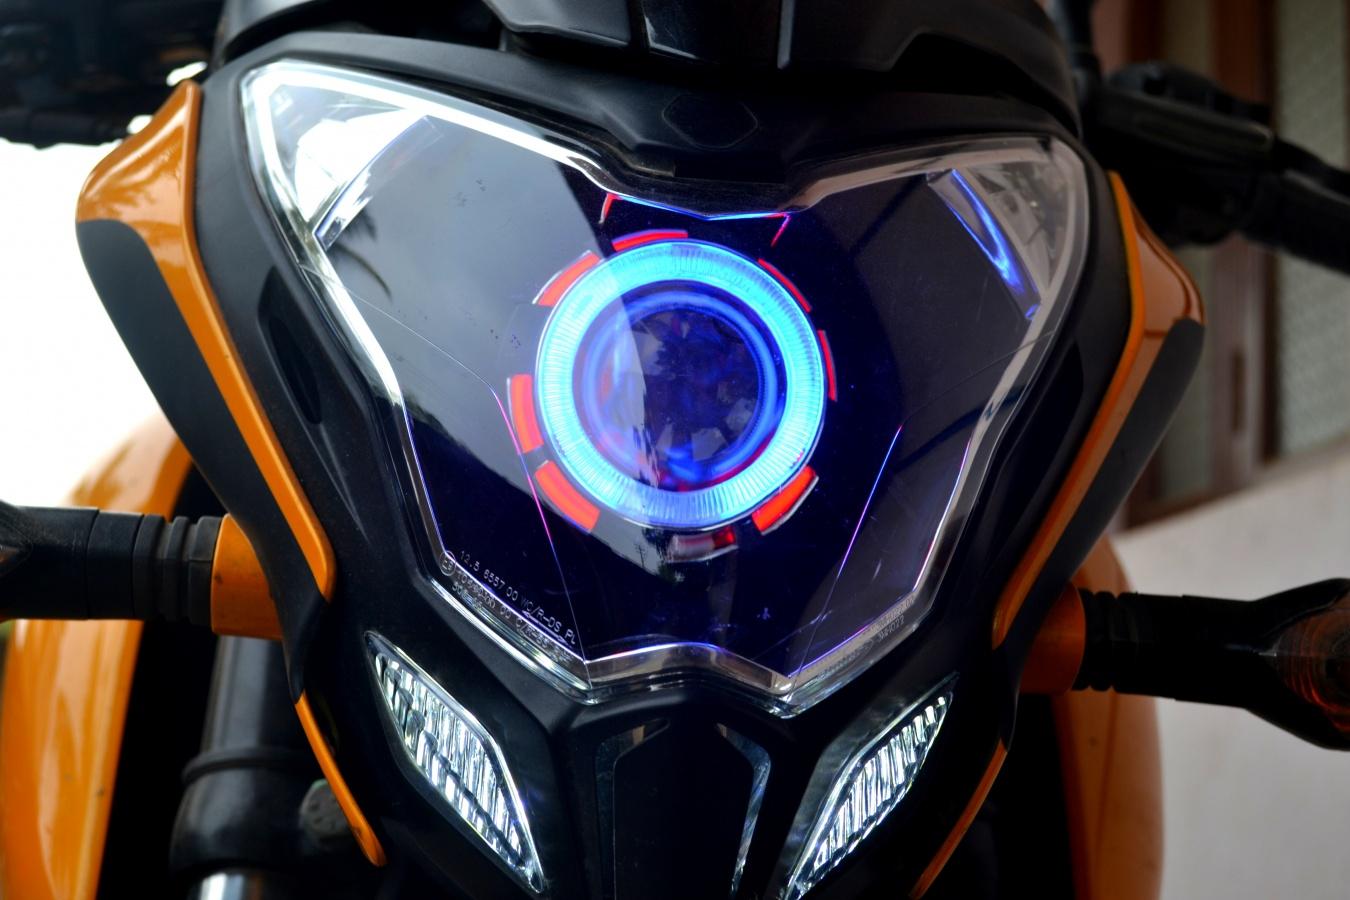 Lampada frontale Predator Pulsar 200Ns con Angel Eyes Sansinnocom-8117